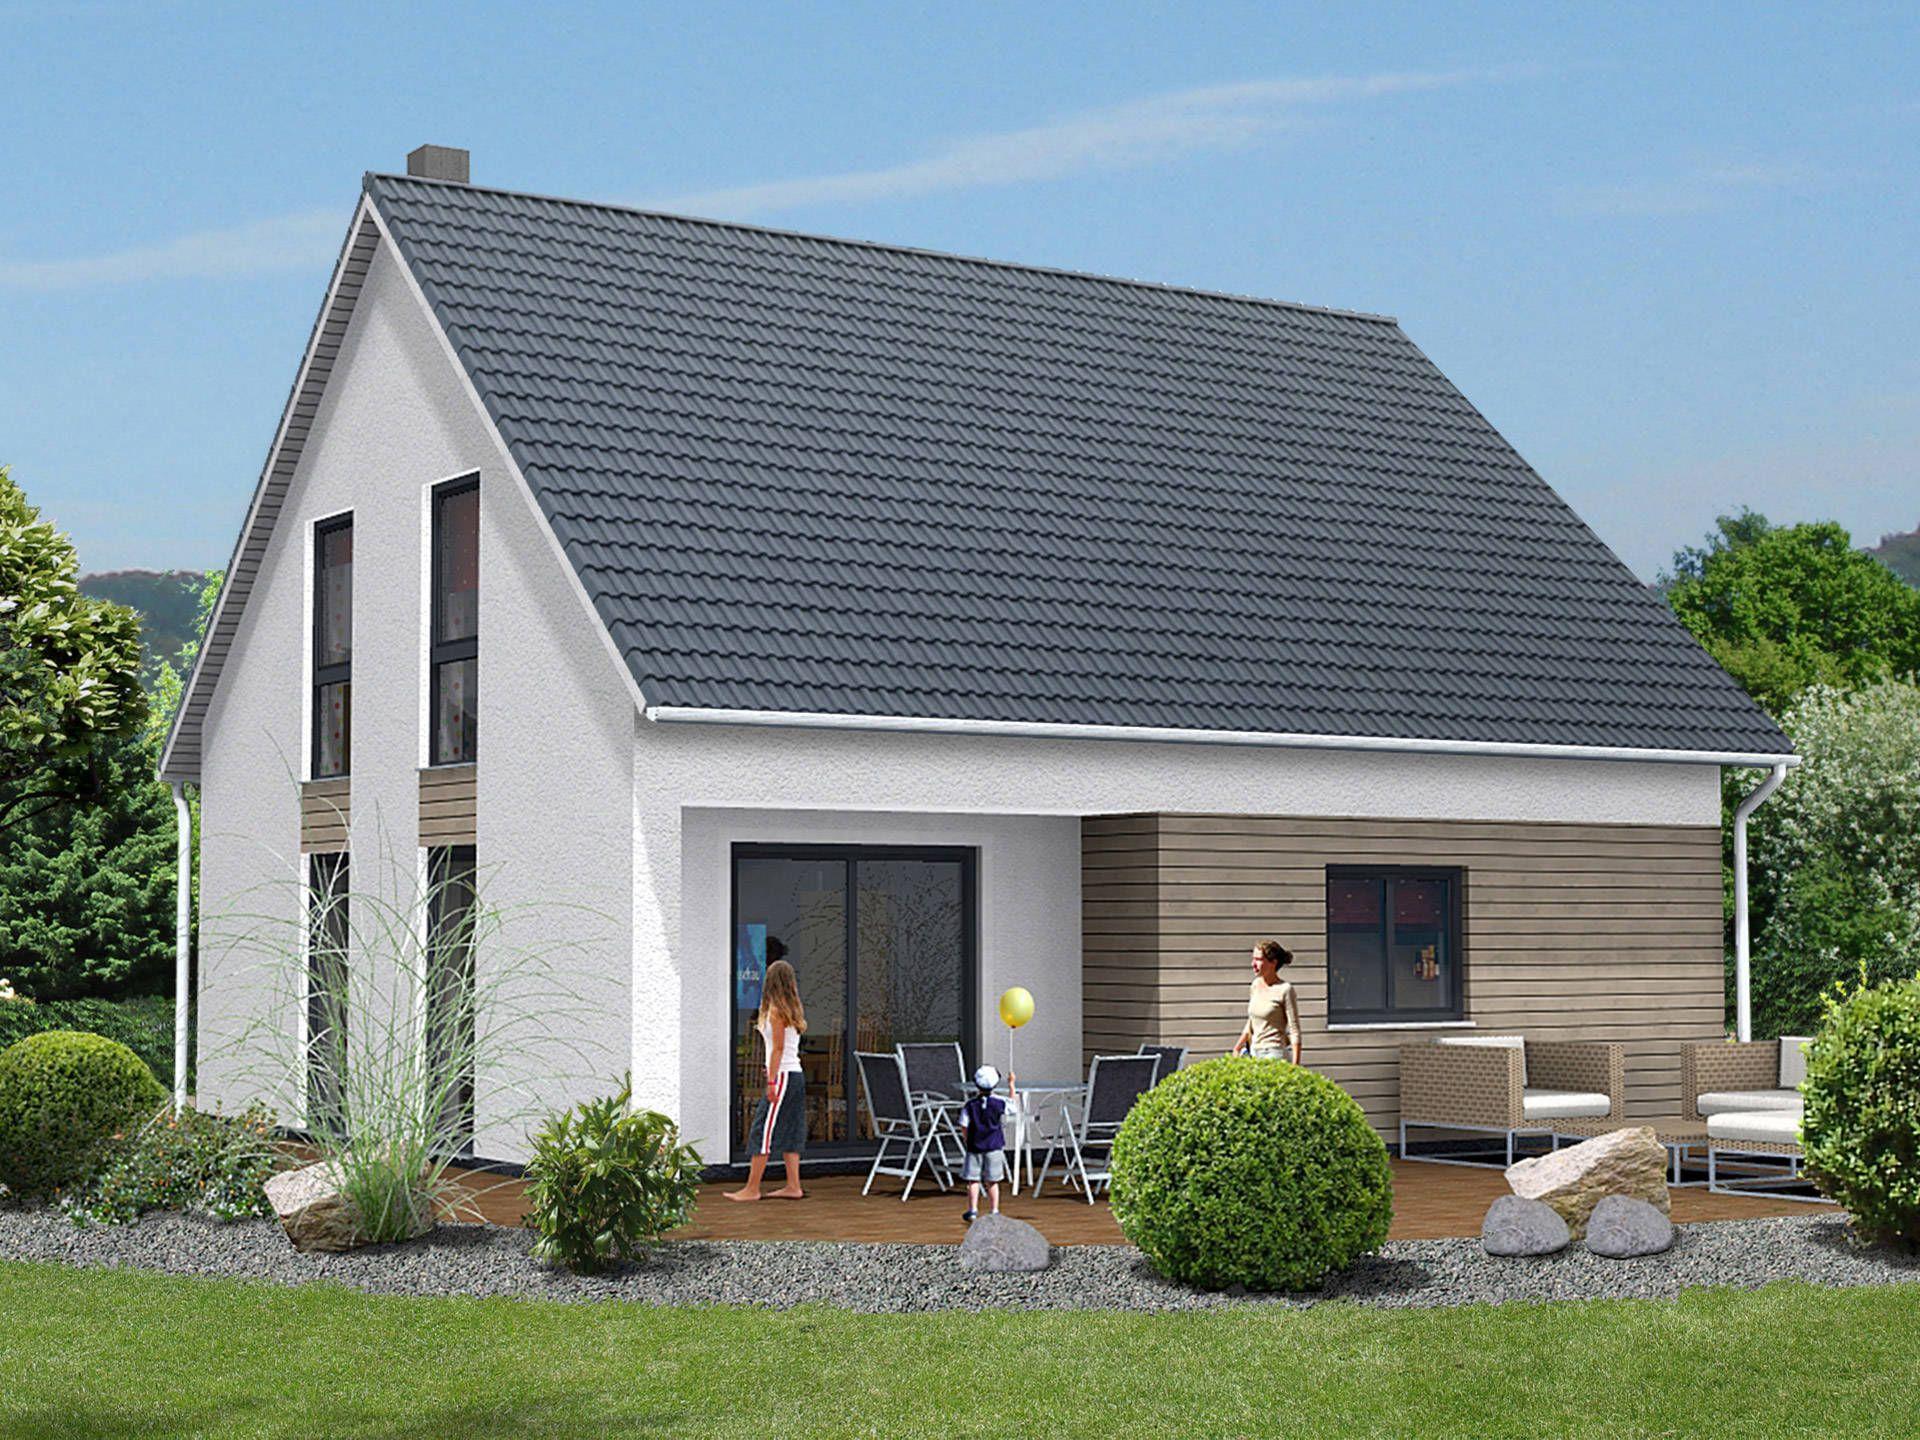 Kompakthaus 114 Energiesparhaus Pinterest